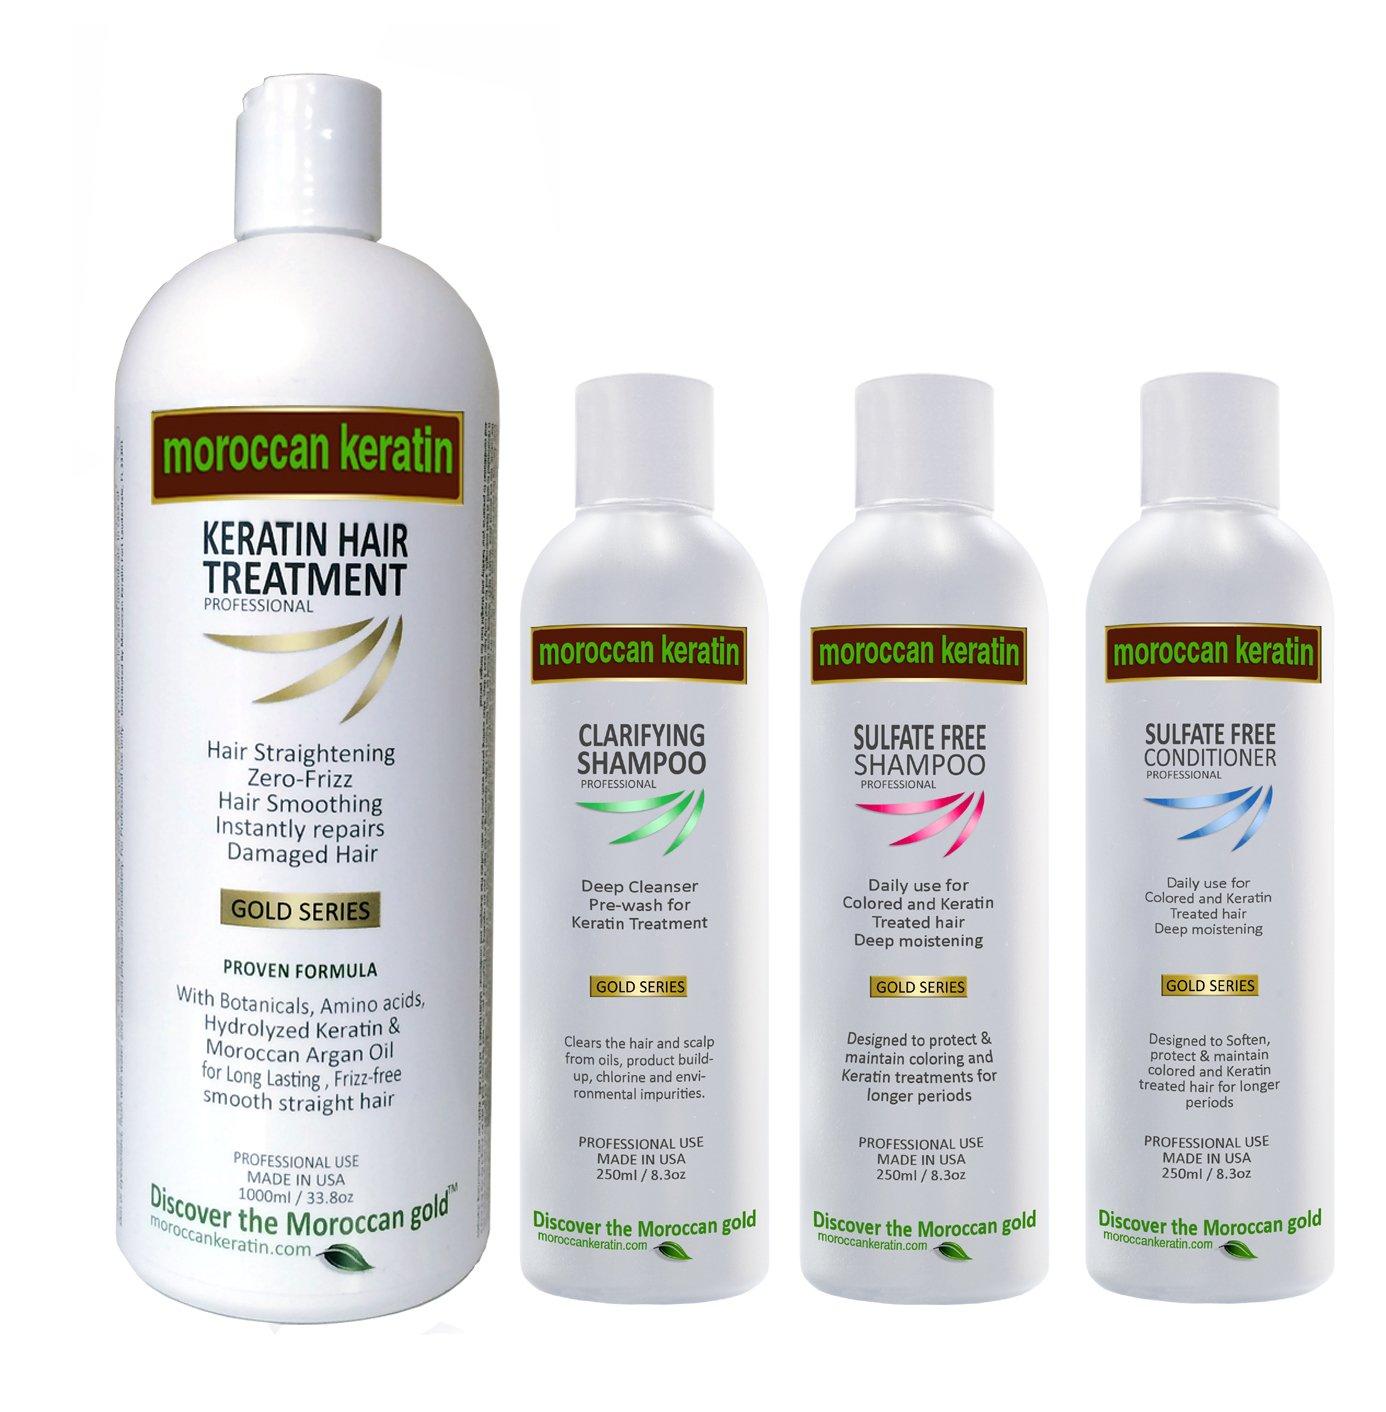 Brazilian Keratin Blowout GOLD SERIES Moroccan Keratin Most Effective Brazilian Keratin Hair Treatment SET 4 bottles 1000ml plus 250ML x3 Professional Salon Formula Shipping Available Worldwide